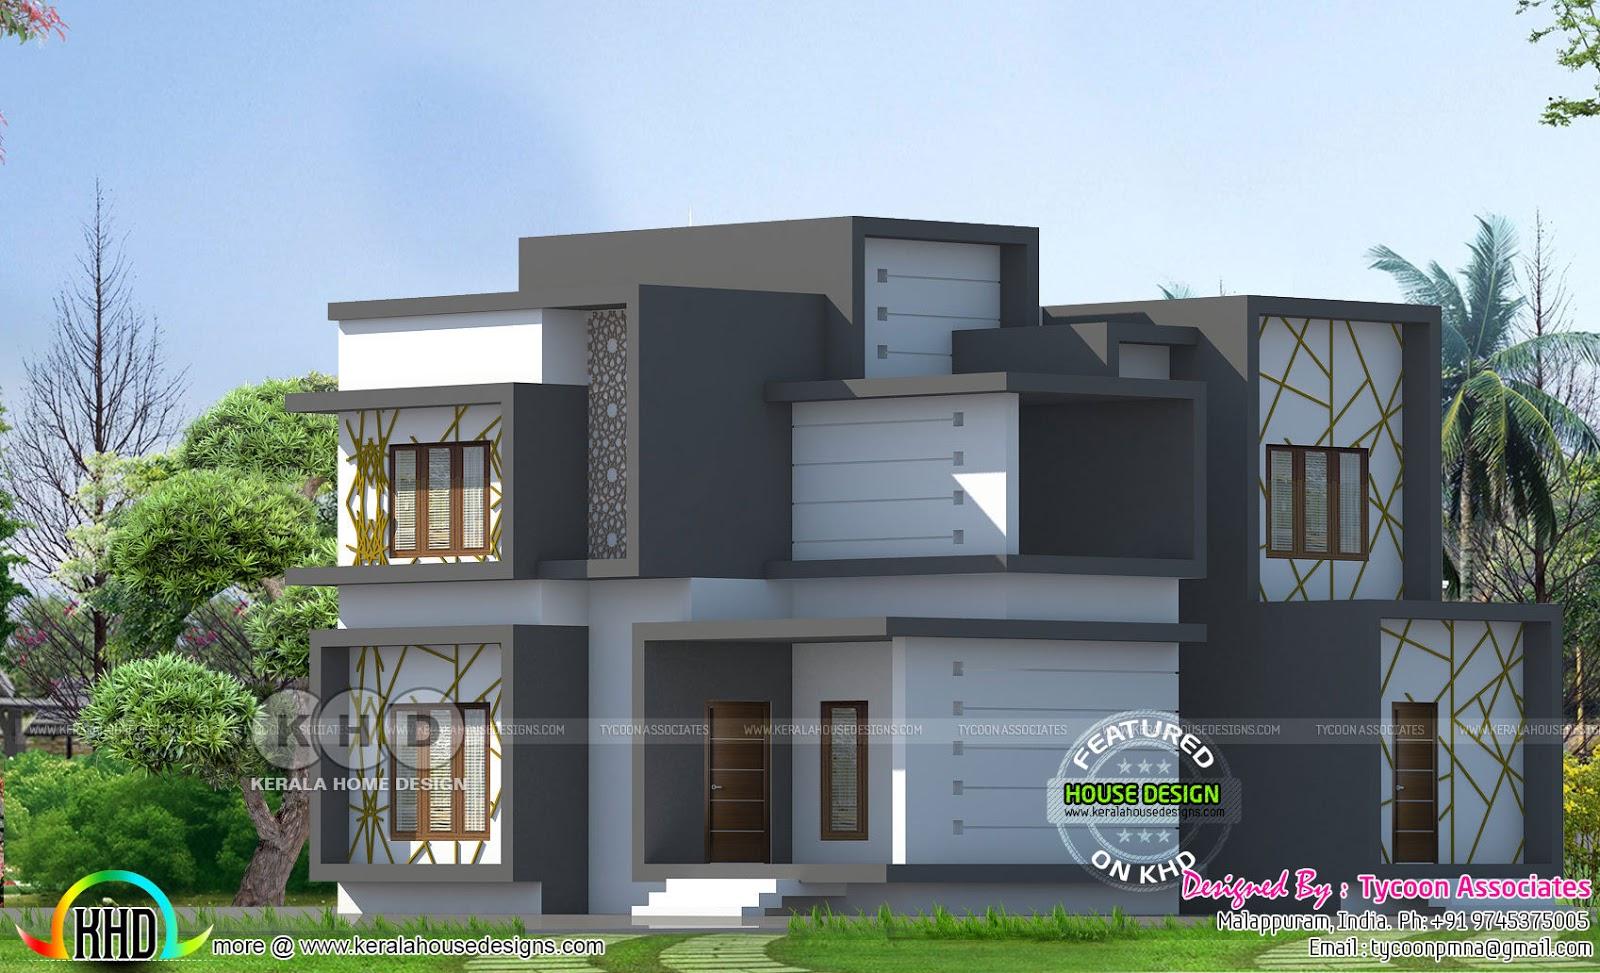 Flat roof modern home by Tycoon Associates - Kerala home ...